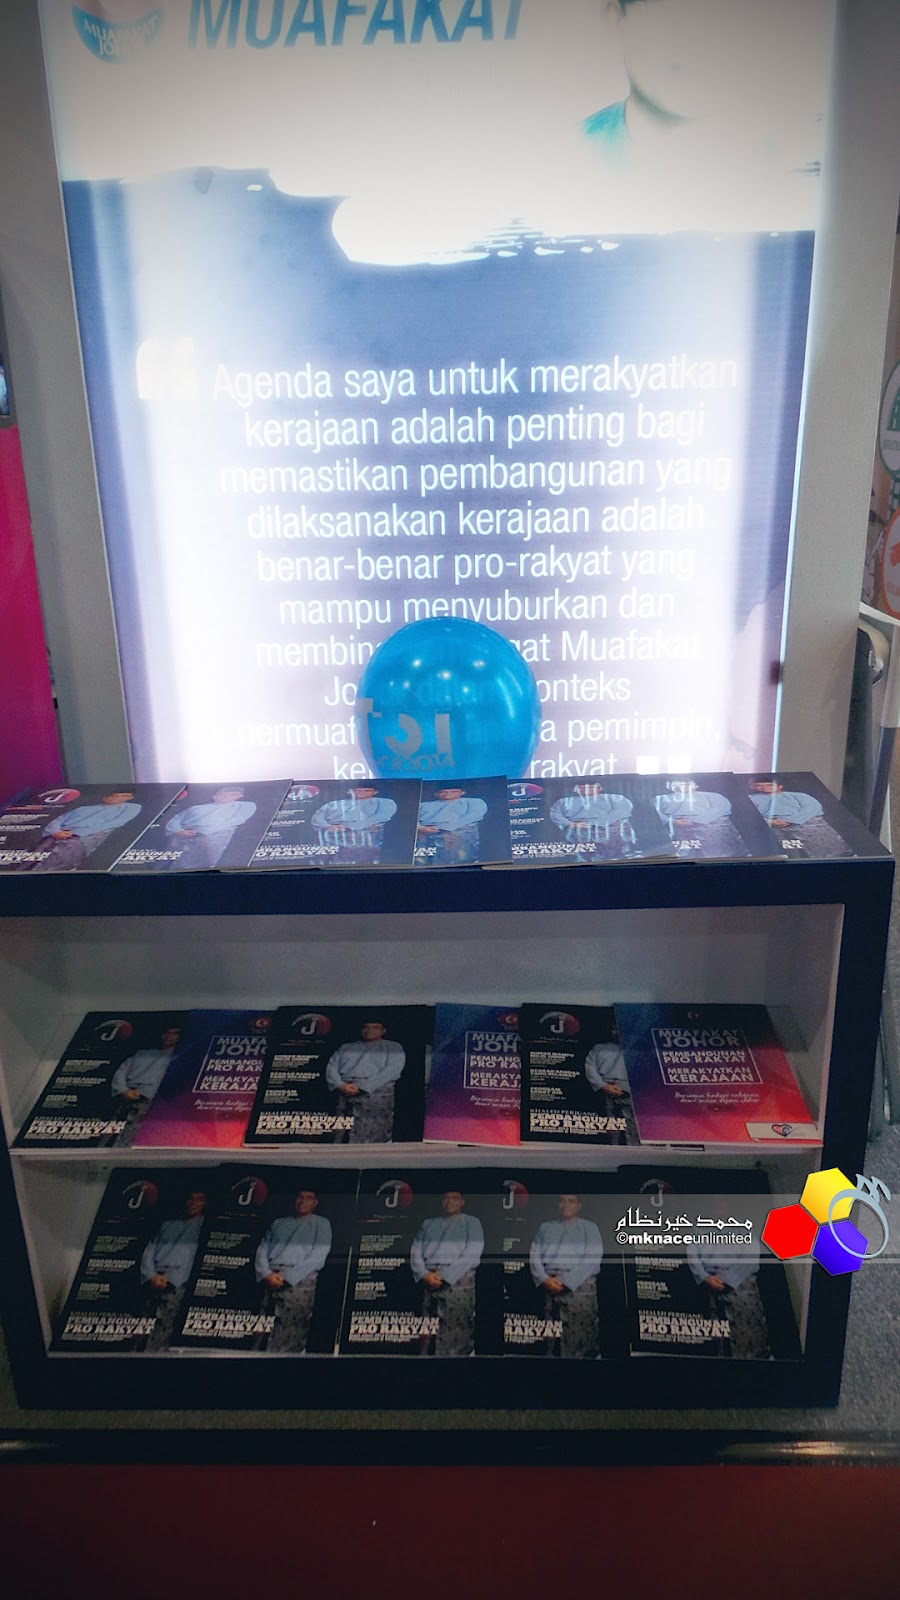 Minggu Sains Teknologi Dan Ict Negeri Johor 2014 Misti Casing Alcatroz Azzura Z1 Vx Best Buy Pc Case Booth Mb